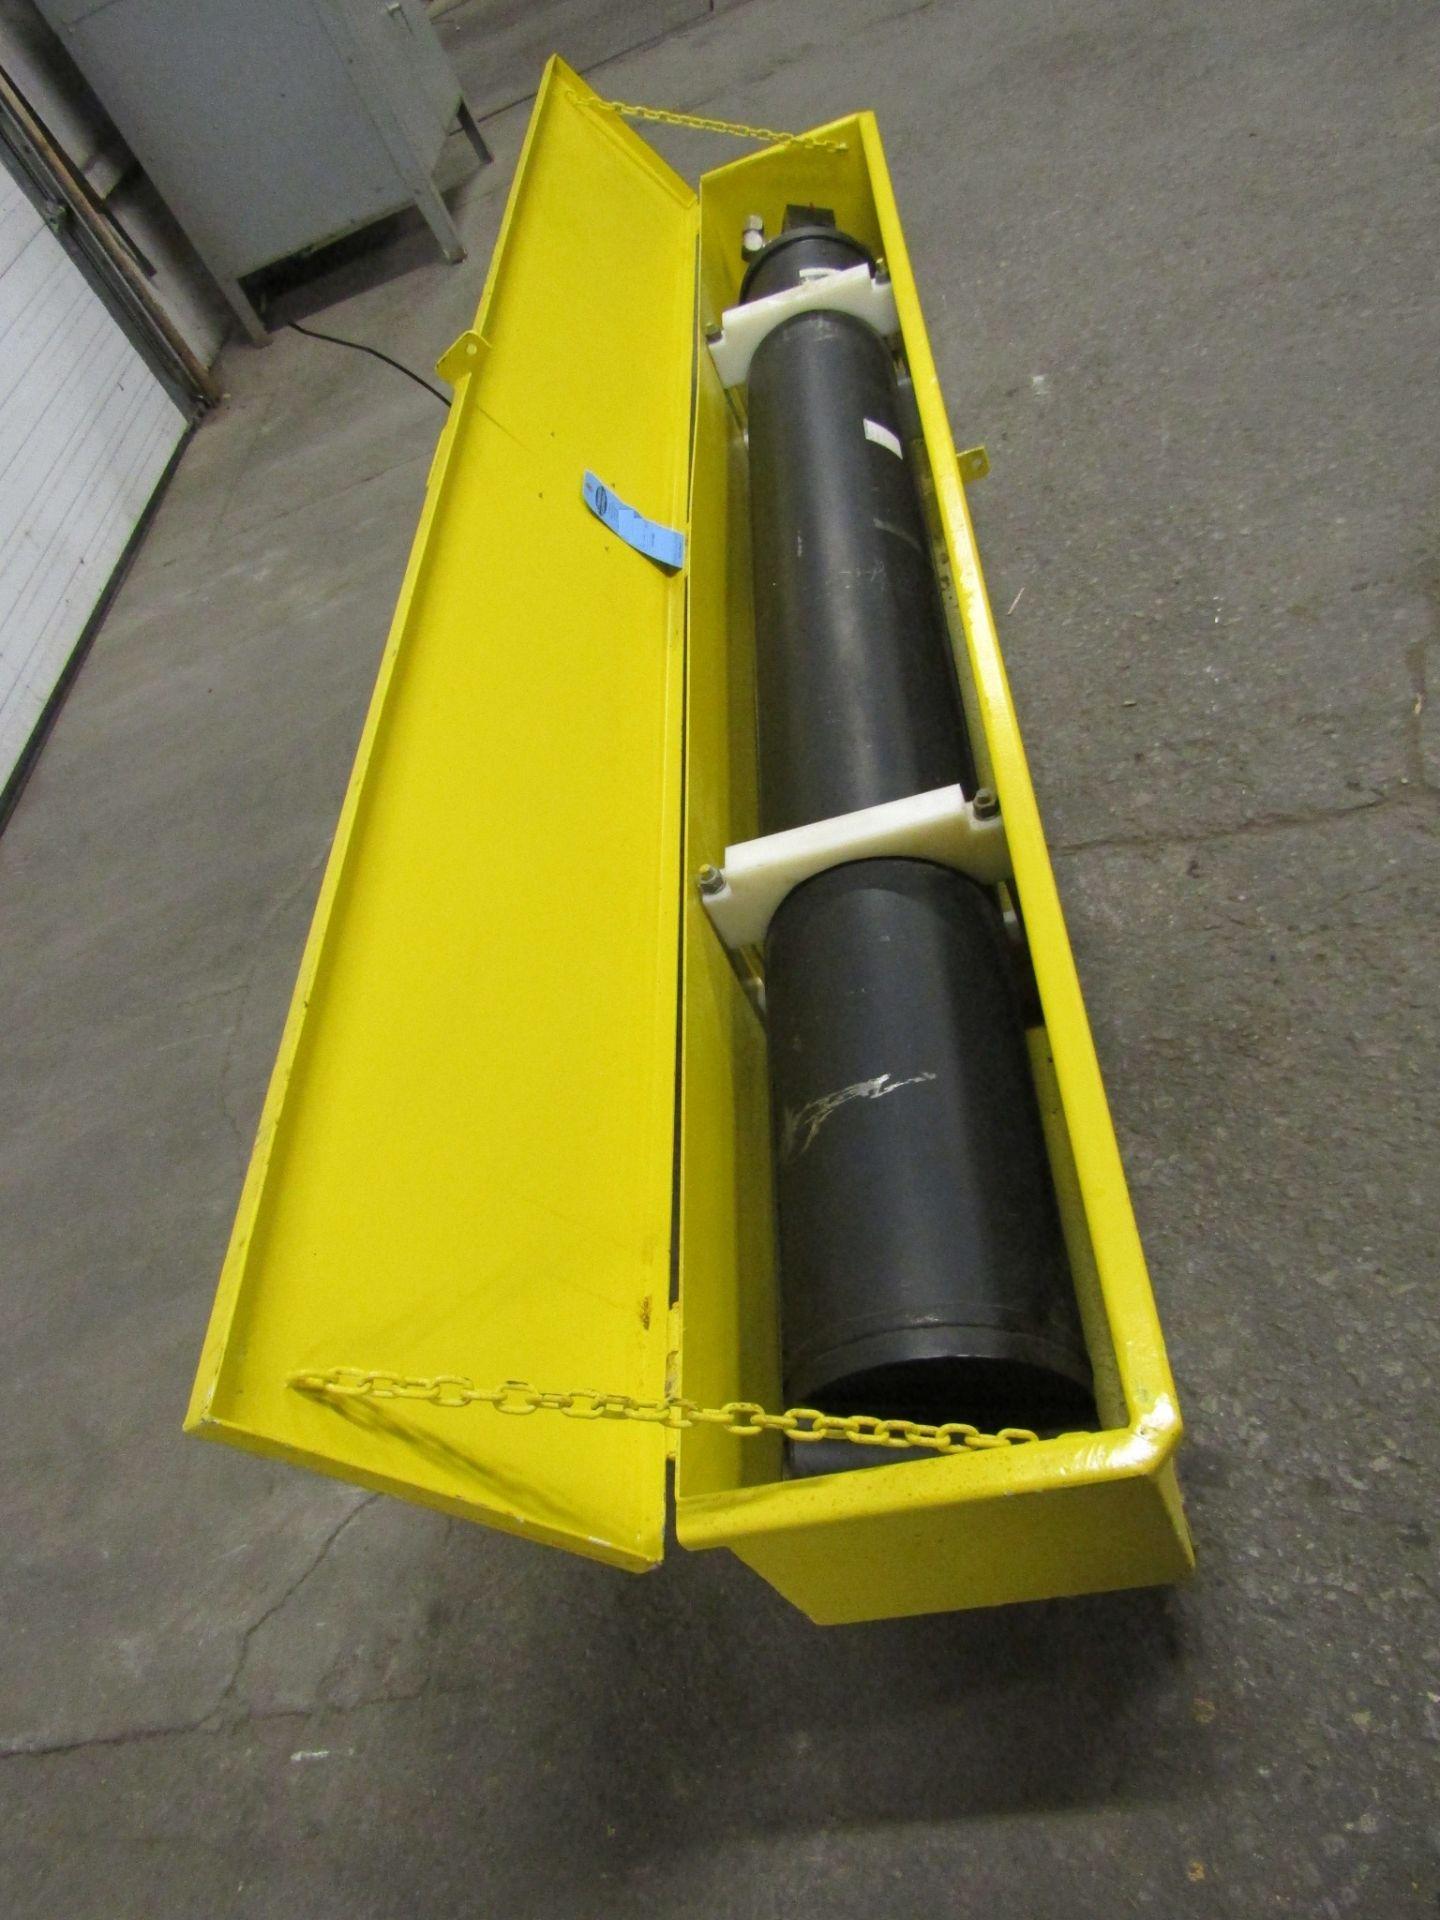 CRT LMC Qualmec Roll-Off Truck 4-stage Hydraulic Cylinder - 8' long NEW UNIT - Image 3 of 5